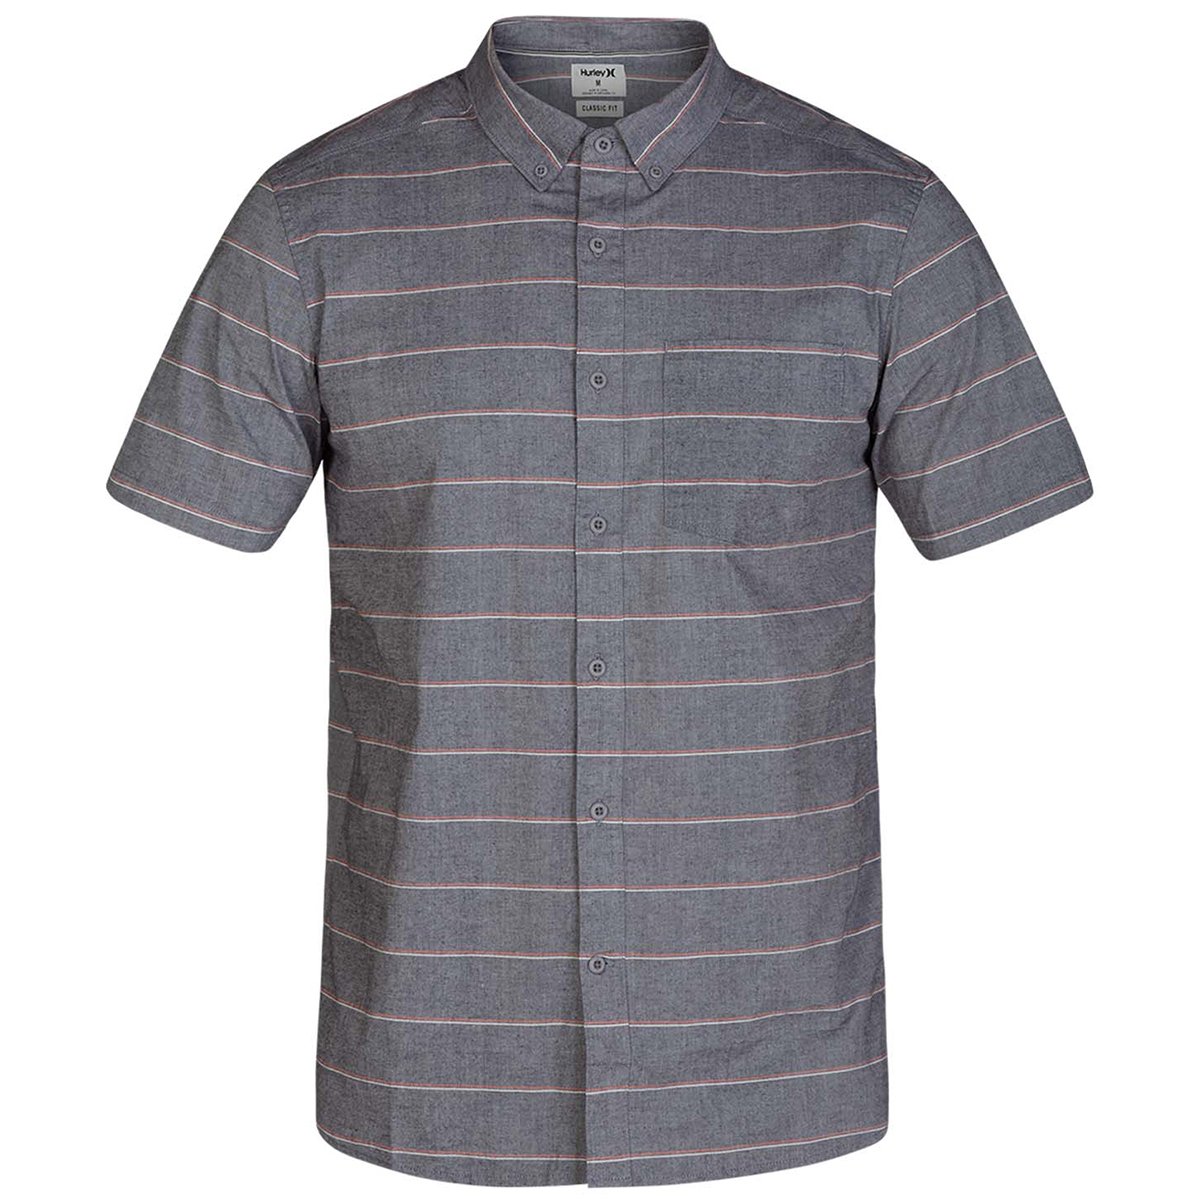 Hurley Men's Keanu Short-Sleeve Shirt - Black, L